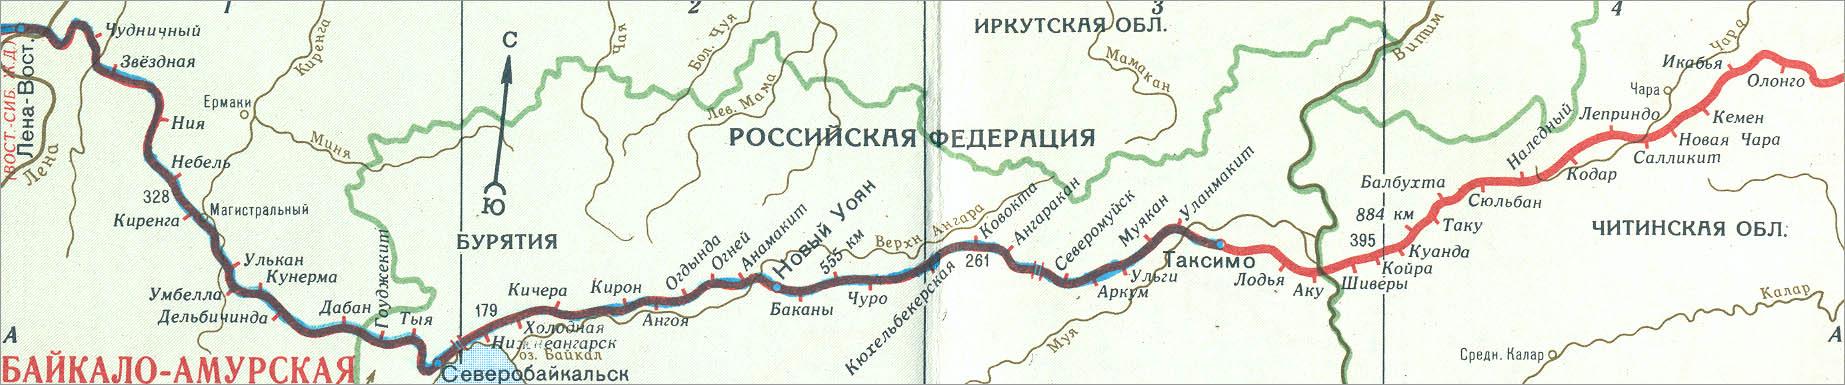 Карта-схема участка Лена -